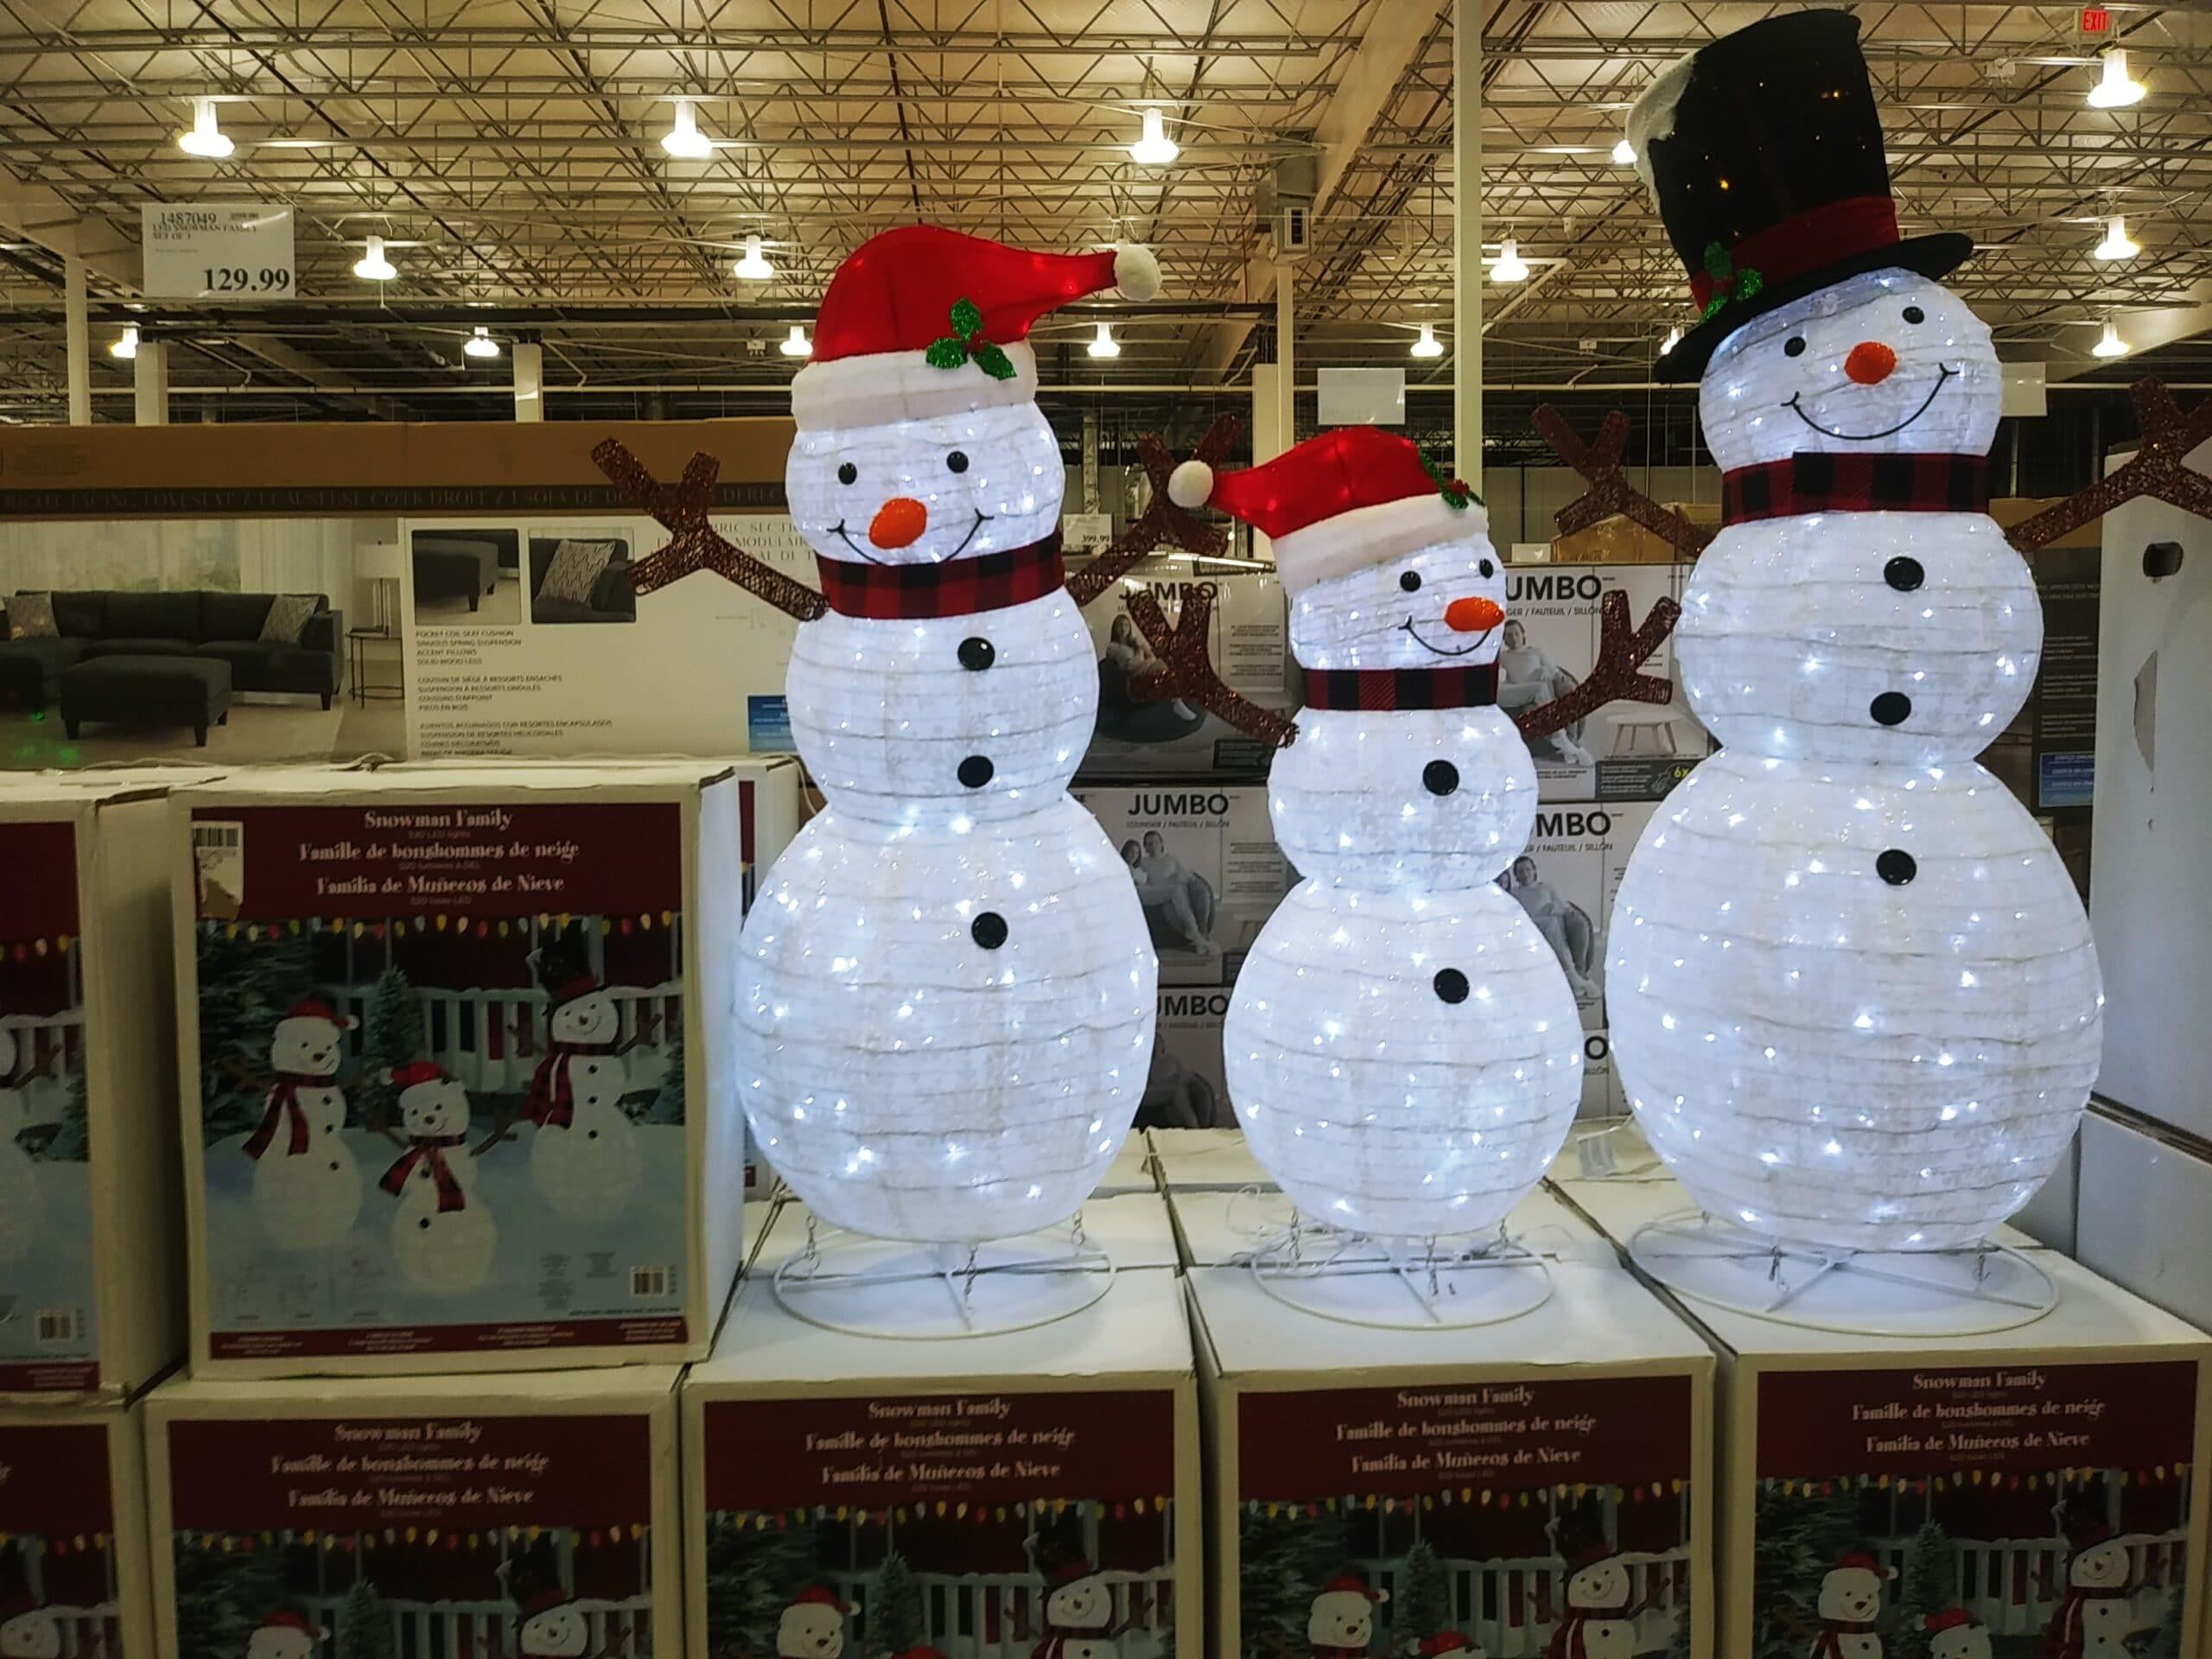 LED Snowman Family 3pk $129.99